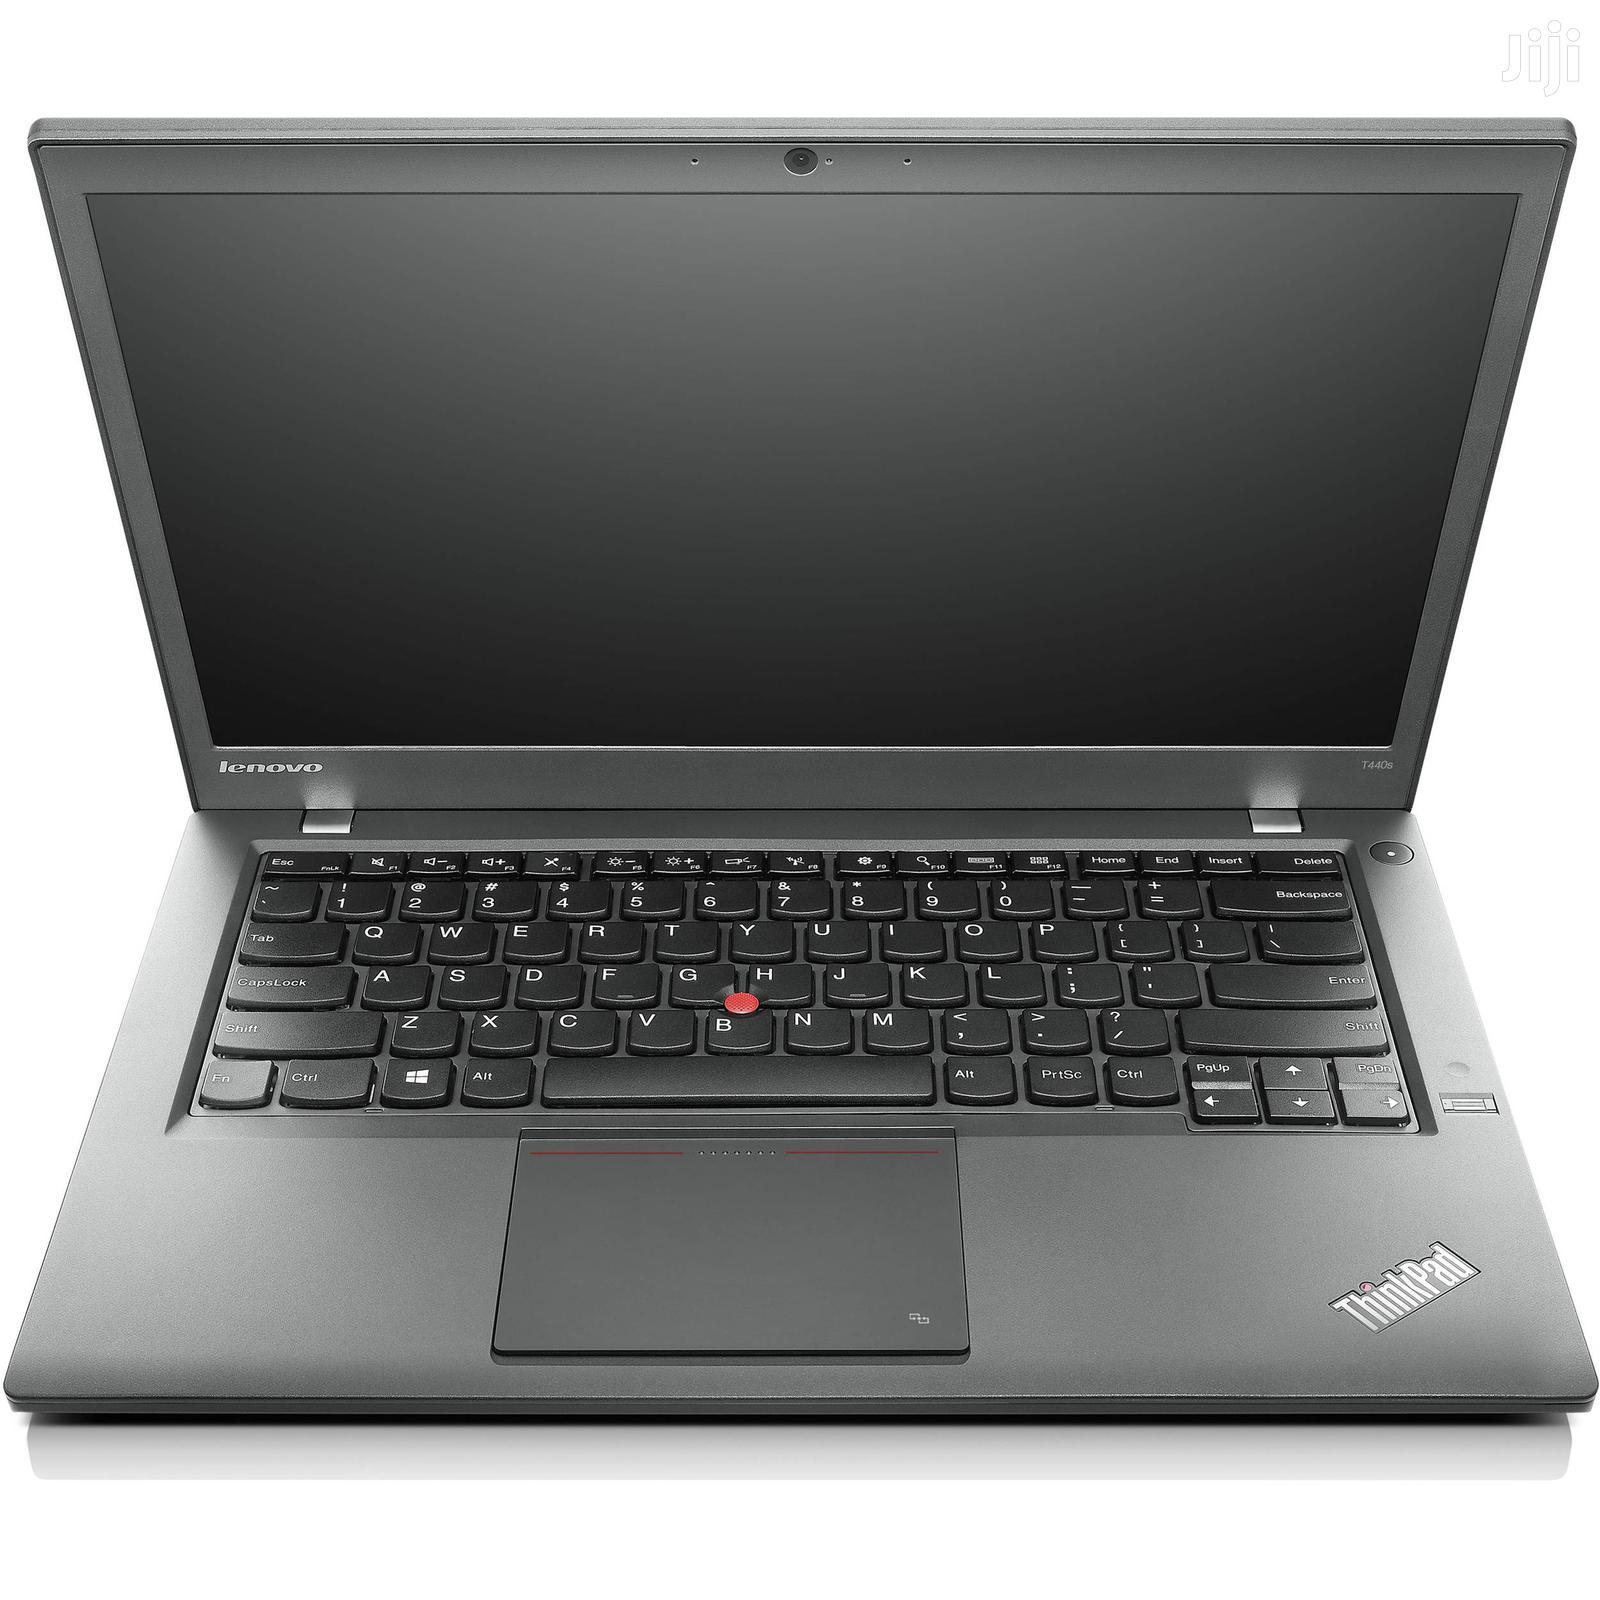 Laptop Lenovo ThinkPad T440s 8GB Intel Core I5 HDD 500GB | Laptops & Computers for sale in Kampala, Central Region, Uganda